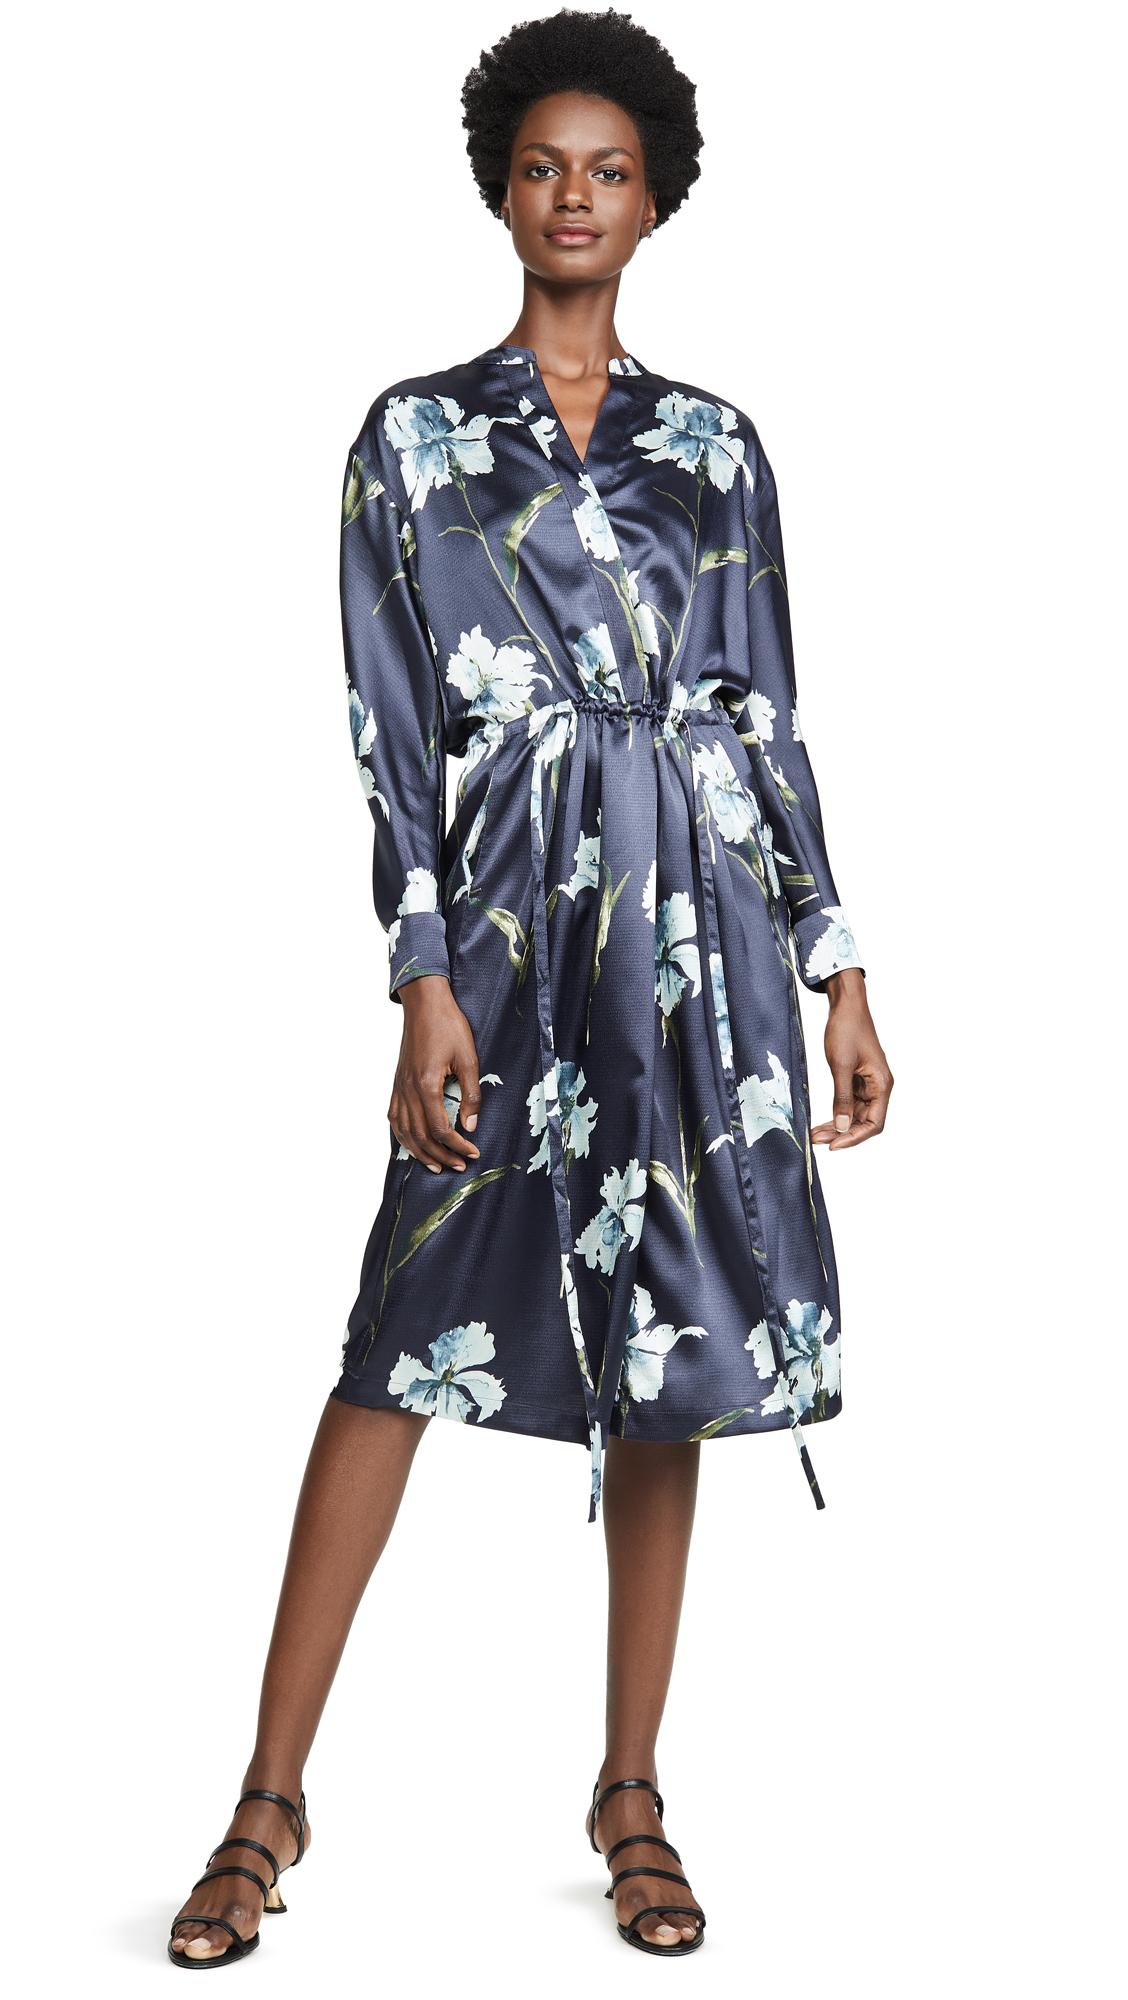 Vince Iris Print Satin Dress – 70% Off Sale